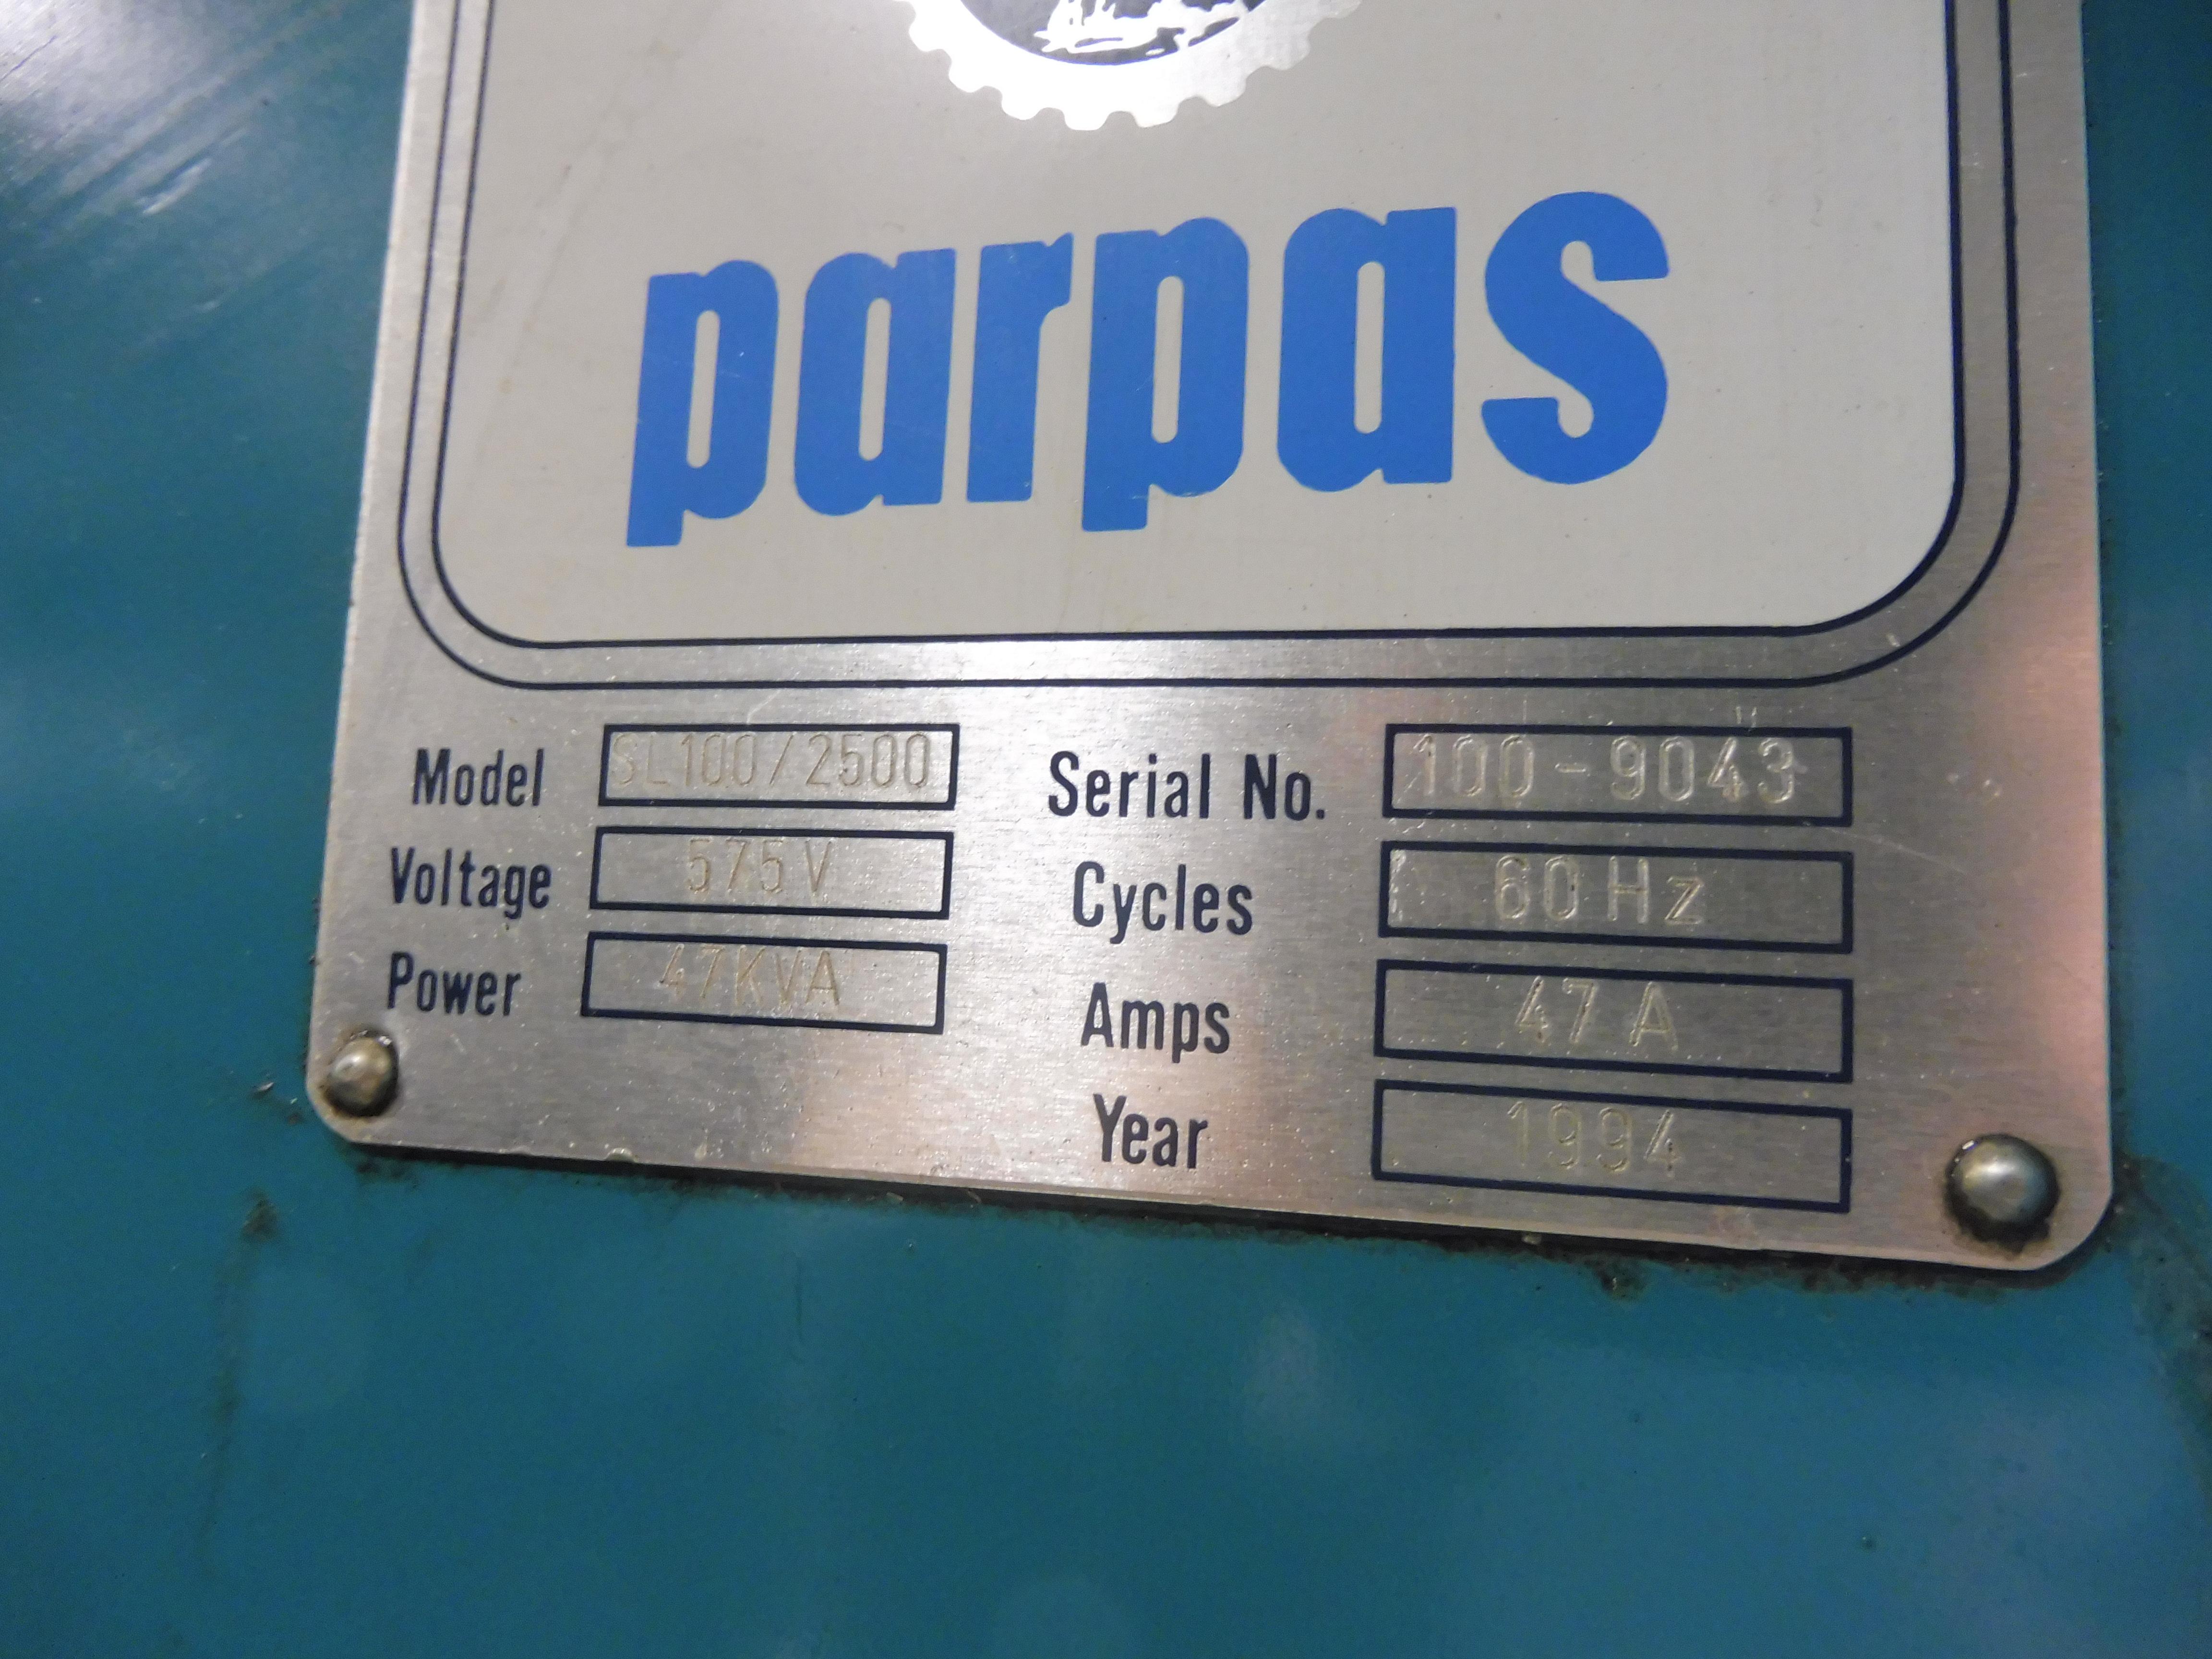 Lot 4 - 1994 PARPAS MODEL SL100/2500 RAM STYLE CNC HORIZONTAL MILL, S/N 100-9043, WITH HEIDENHAIN TNC-415B